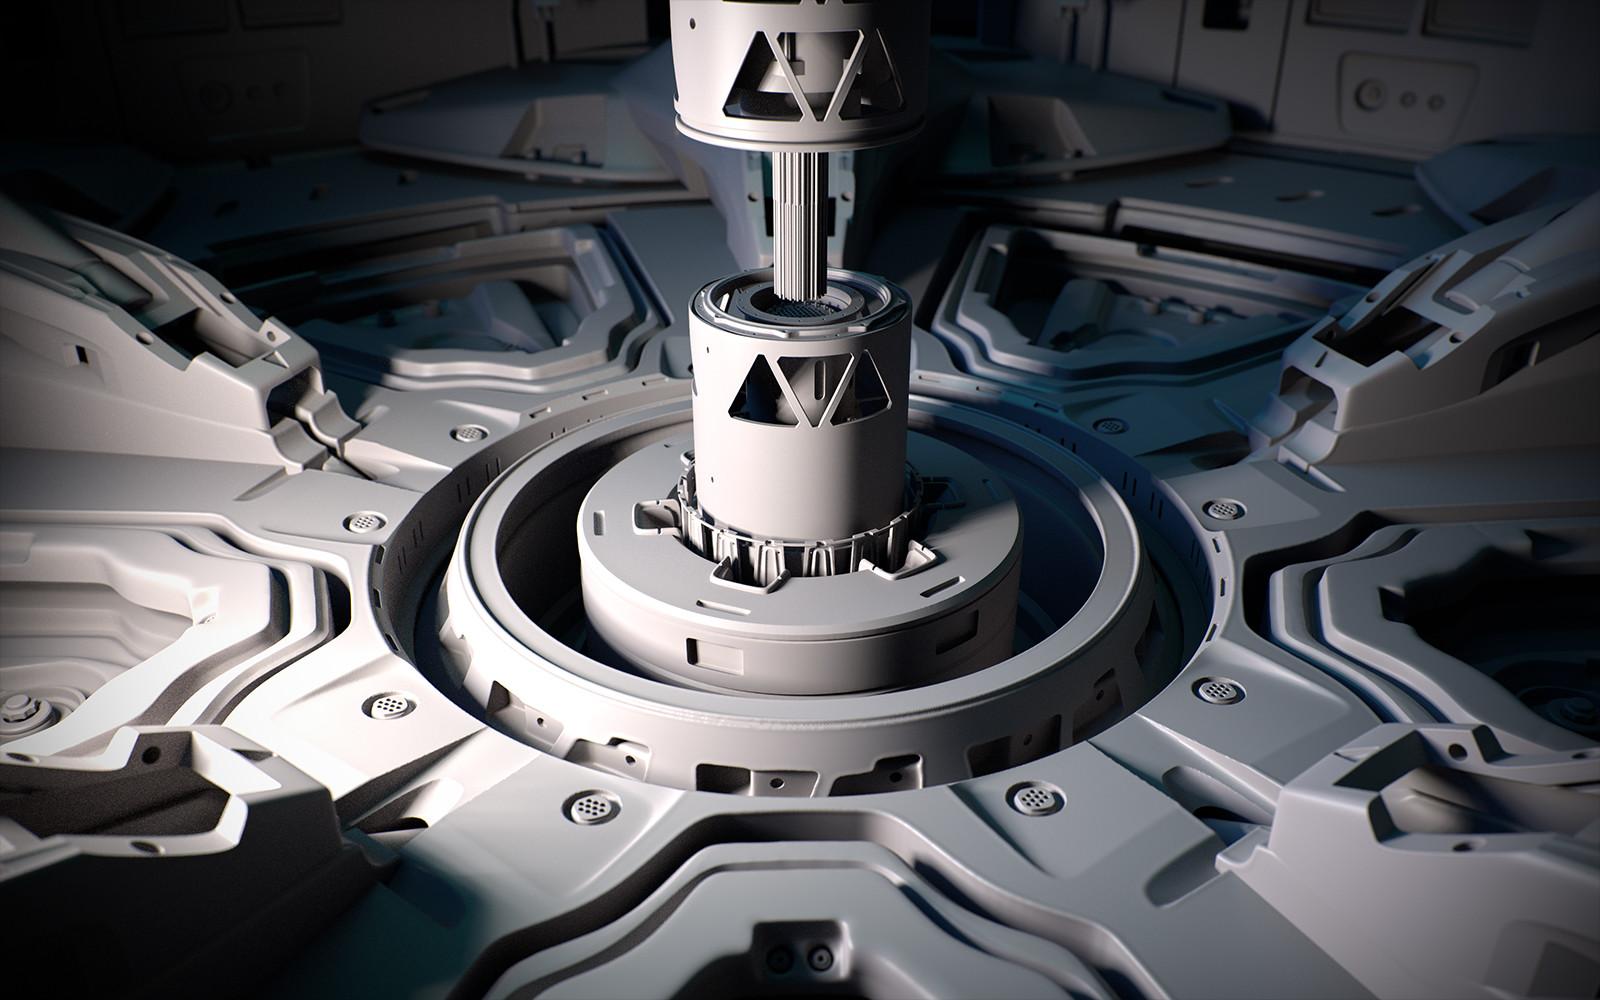 Zbrush 4R8 Beta Sci Fi Nuclear Facility Grey